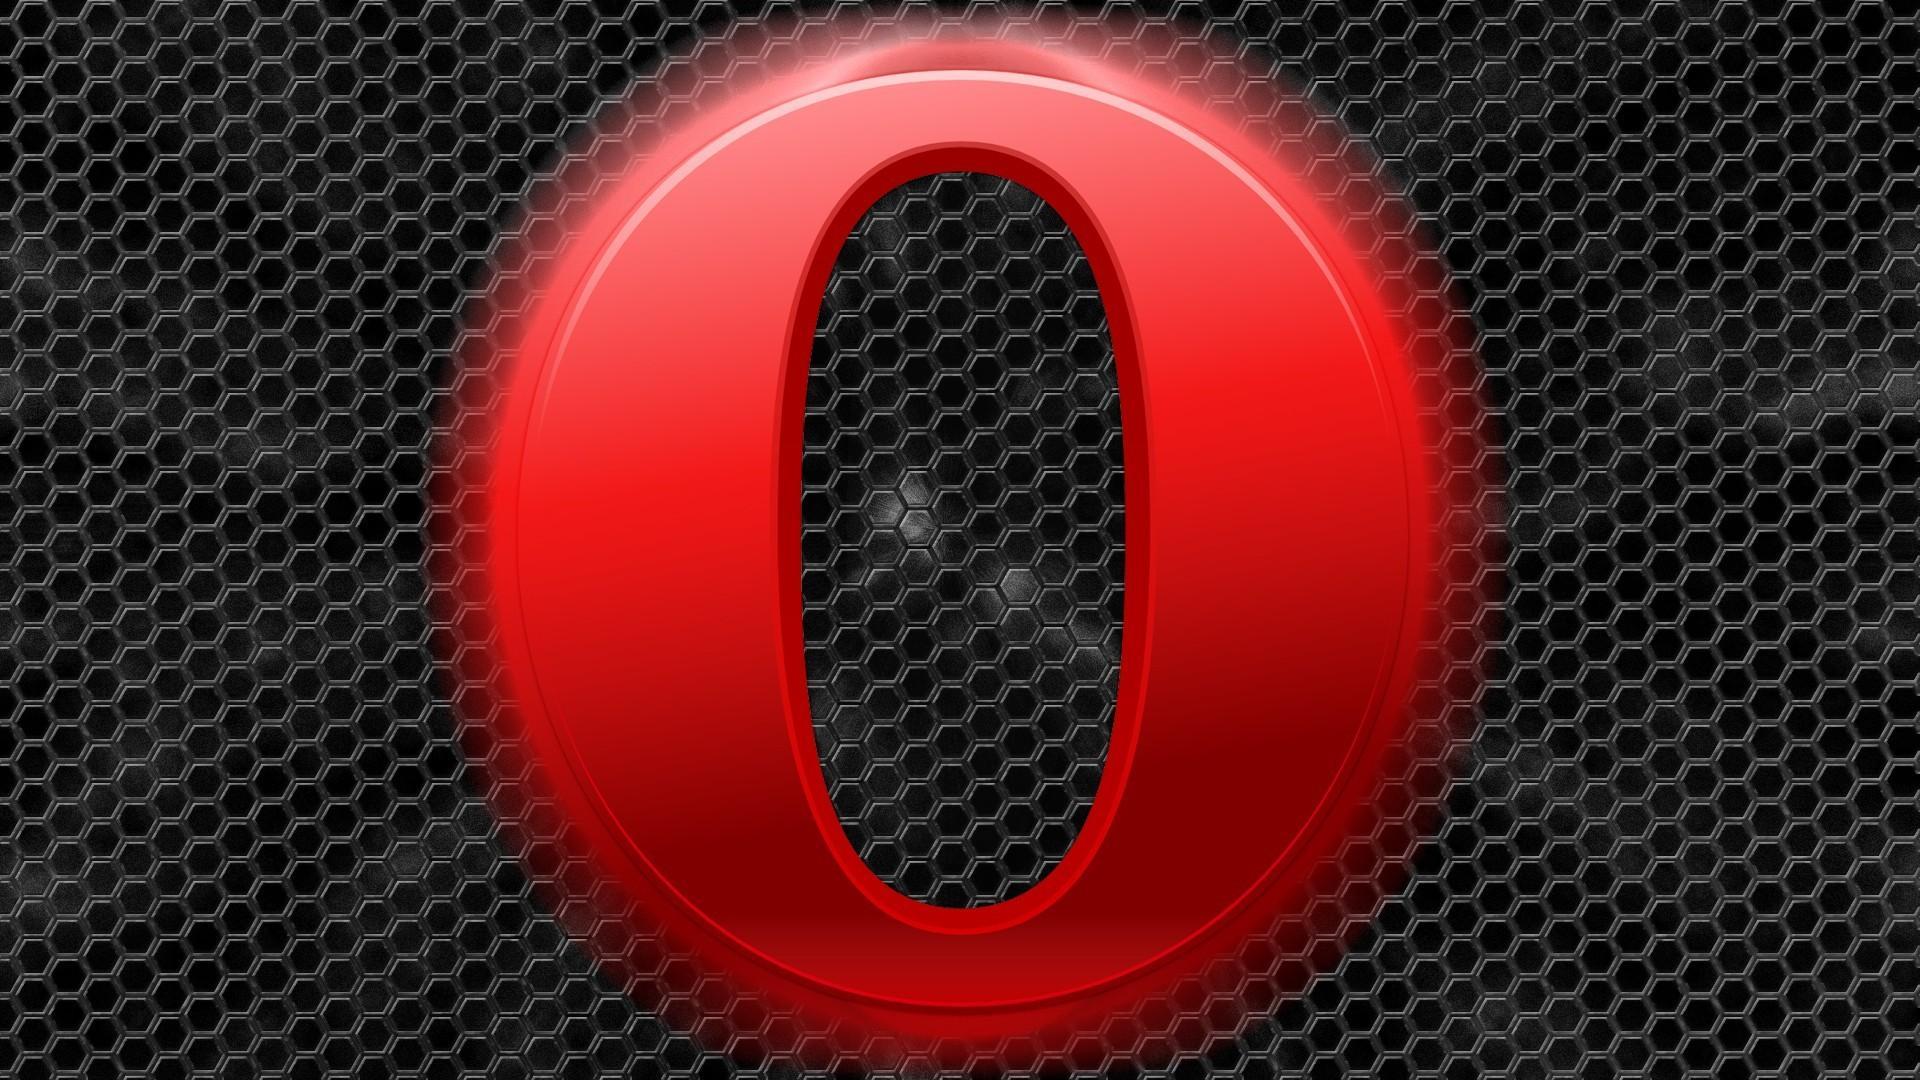 Opera криптовалютный кошелёк браузер